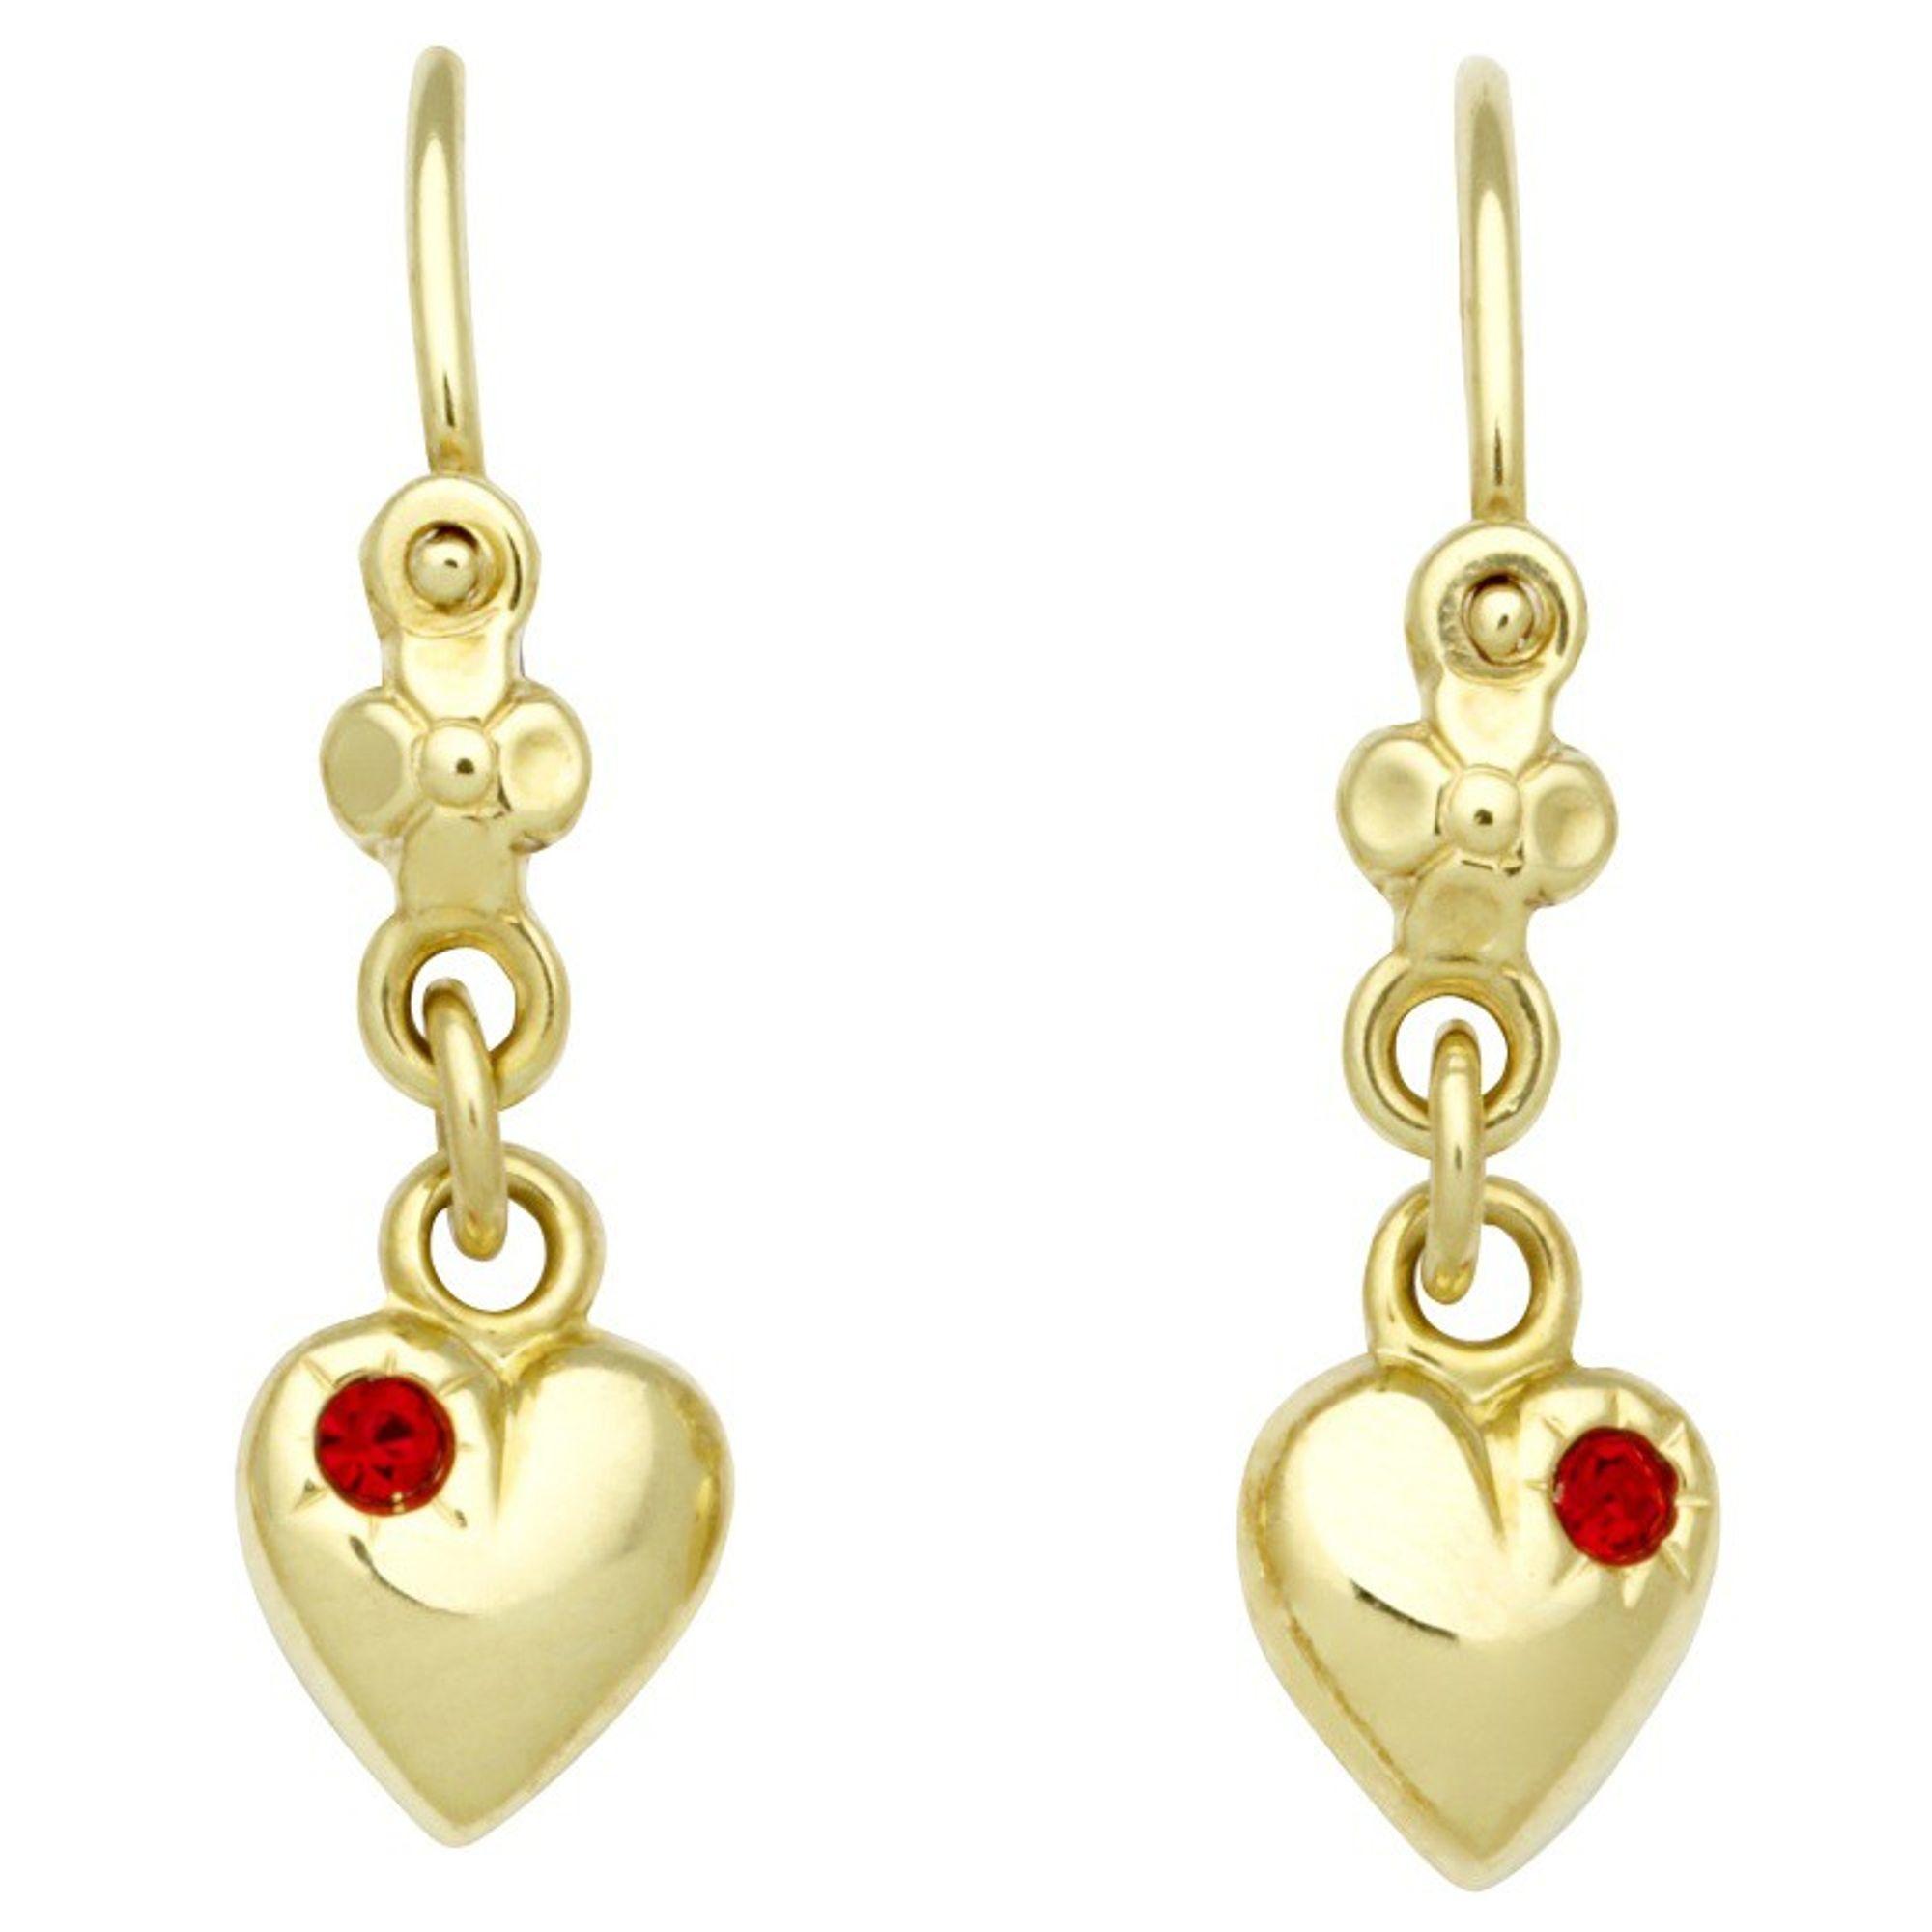 Basic Gold KI47 Mädchen Ohrringe Herz 14 Karat (585) Gelbgold Rot